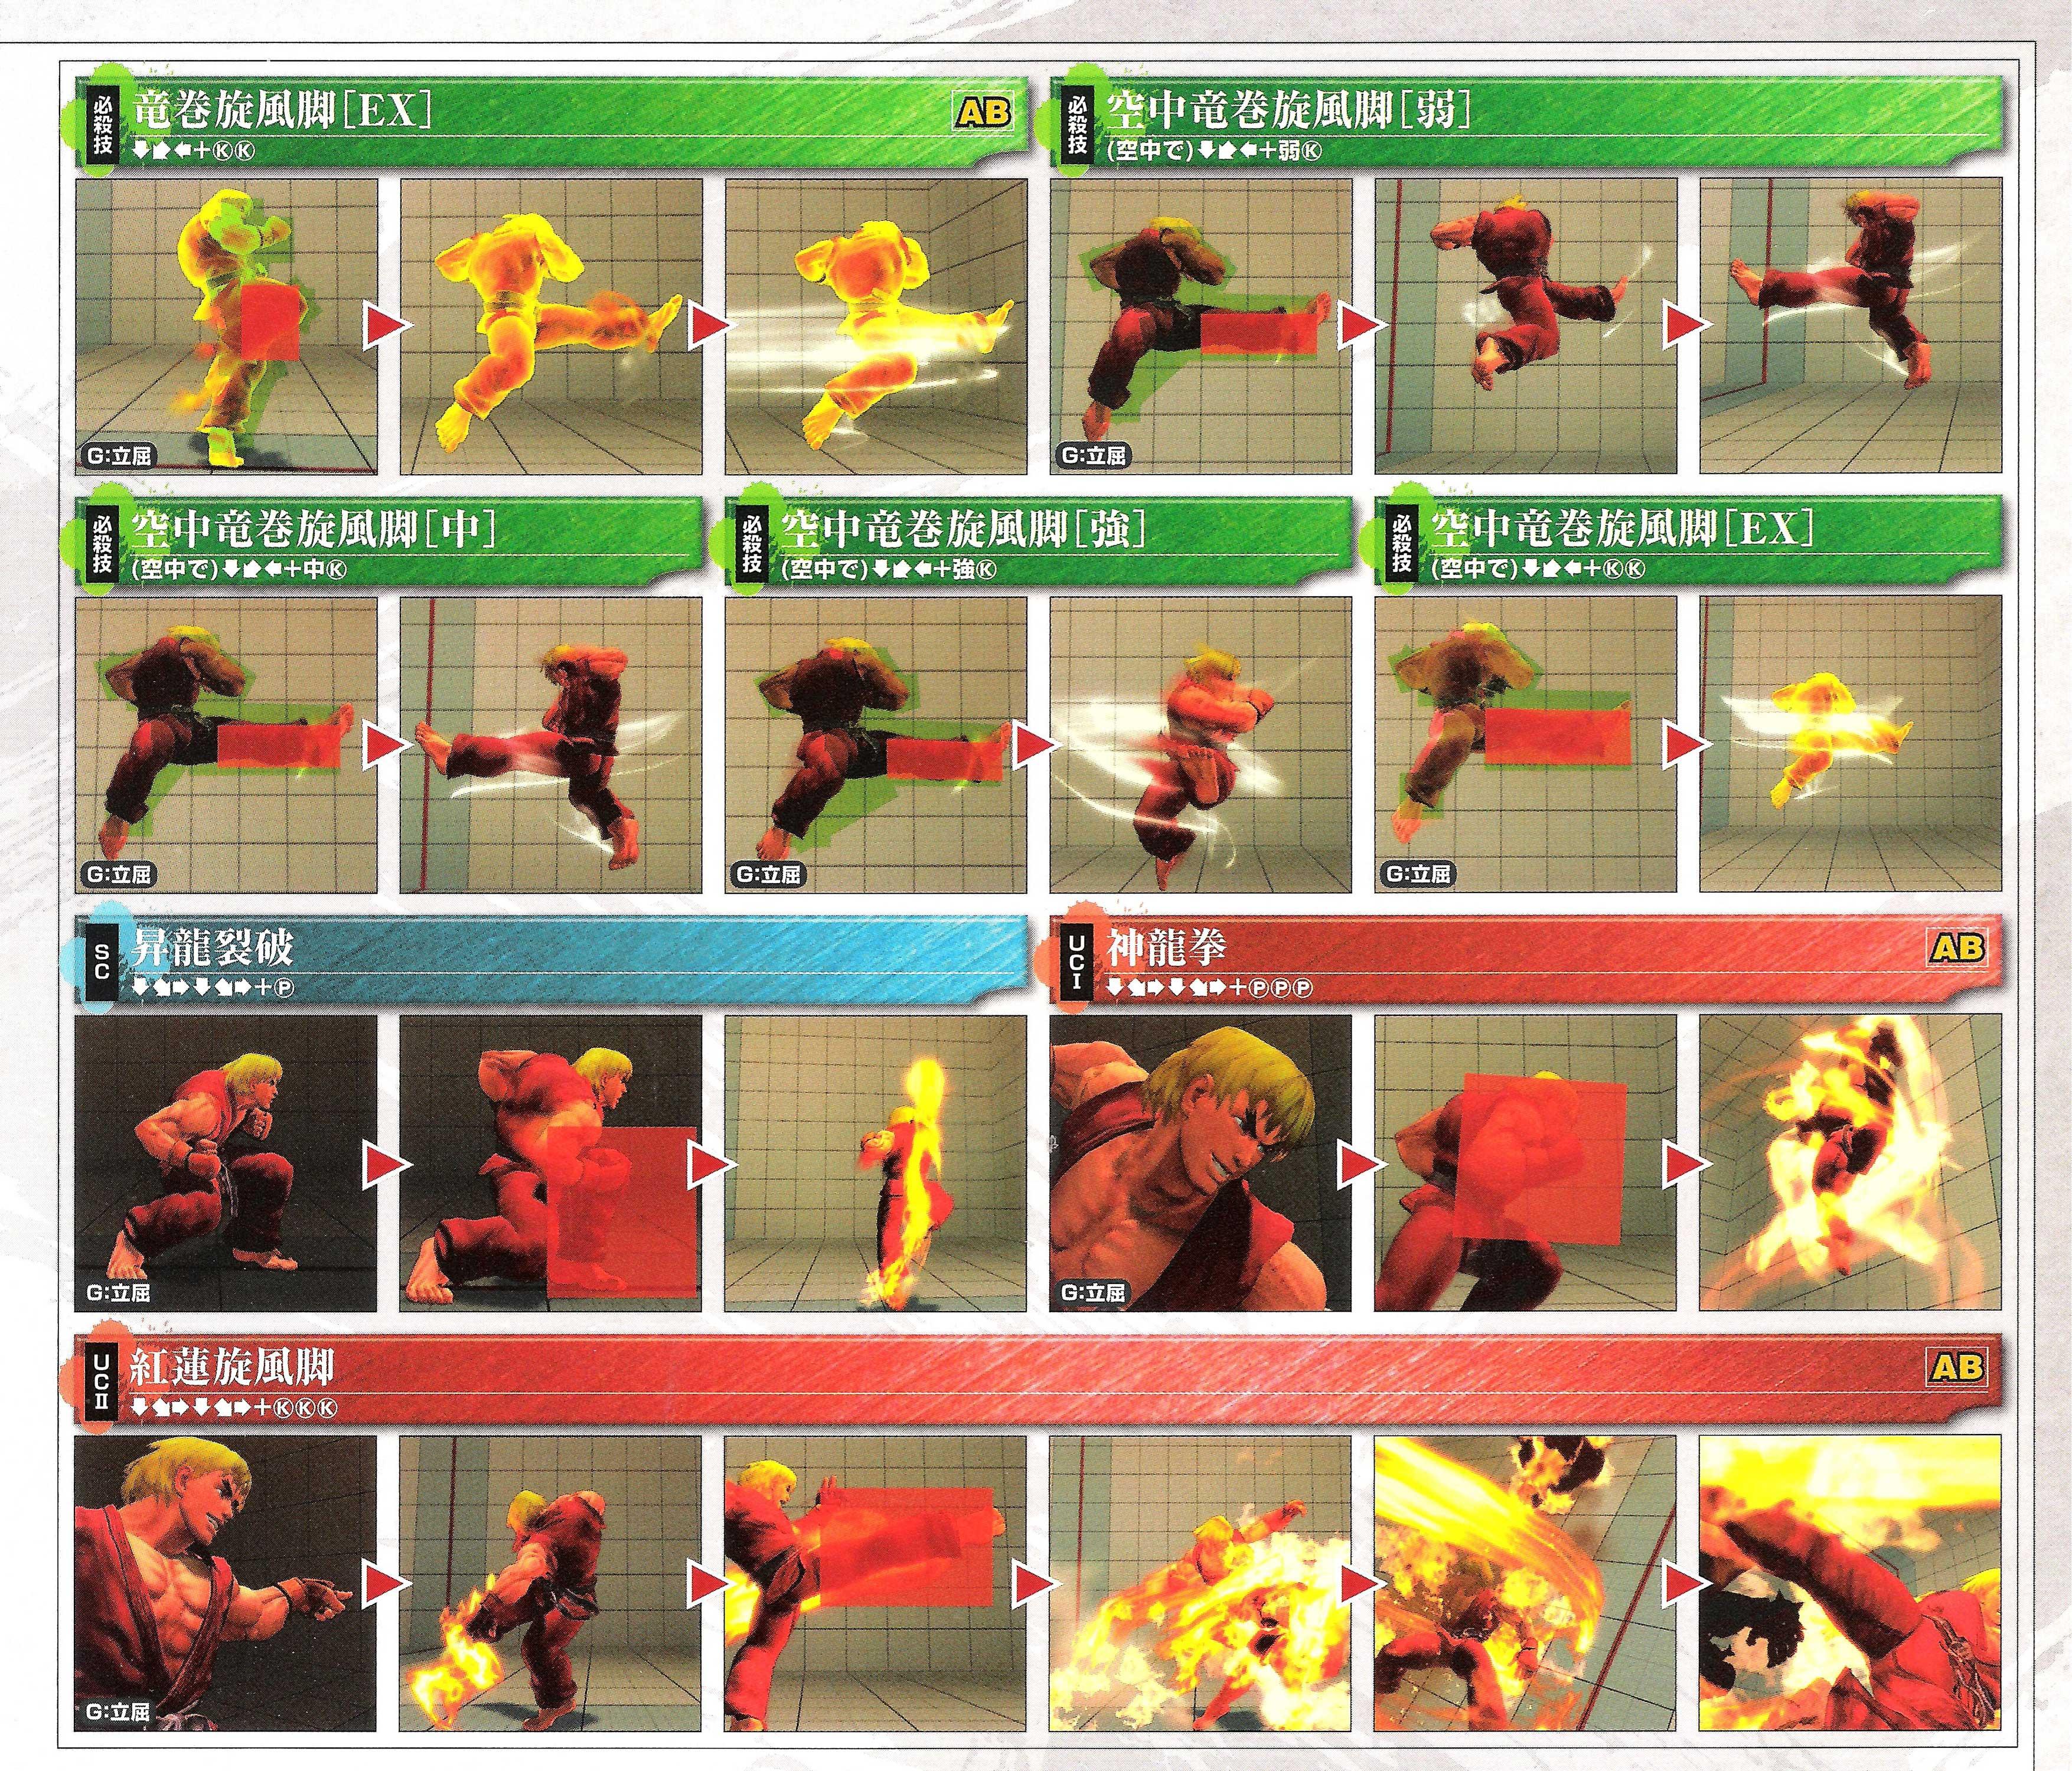 Ken's hit box information for Super Street Fighter 4 Arcade Edition image #3